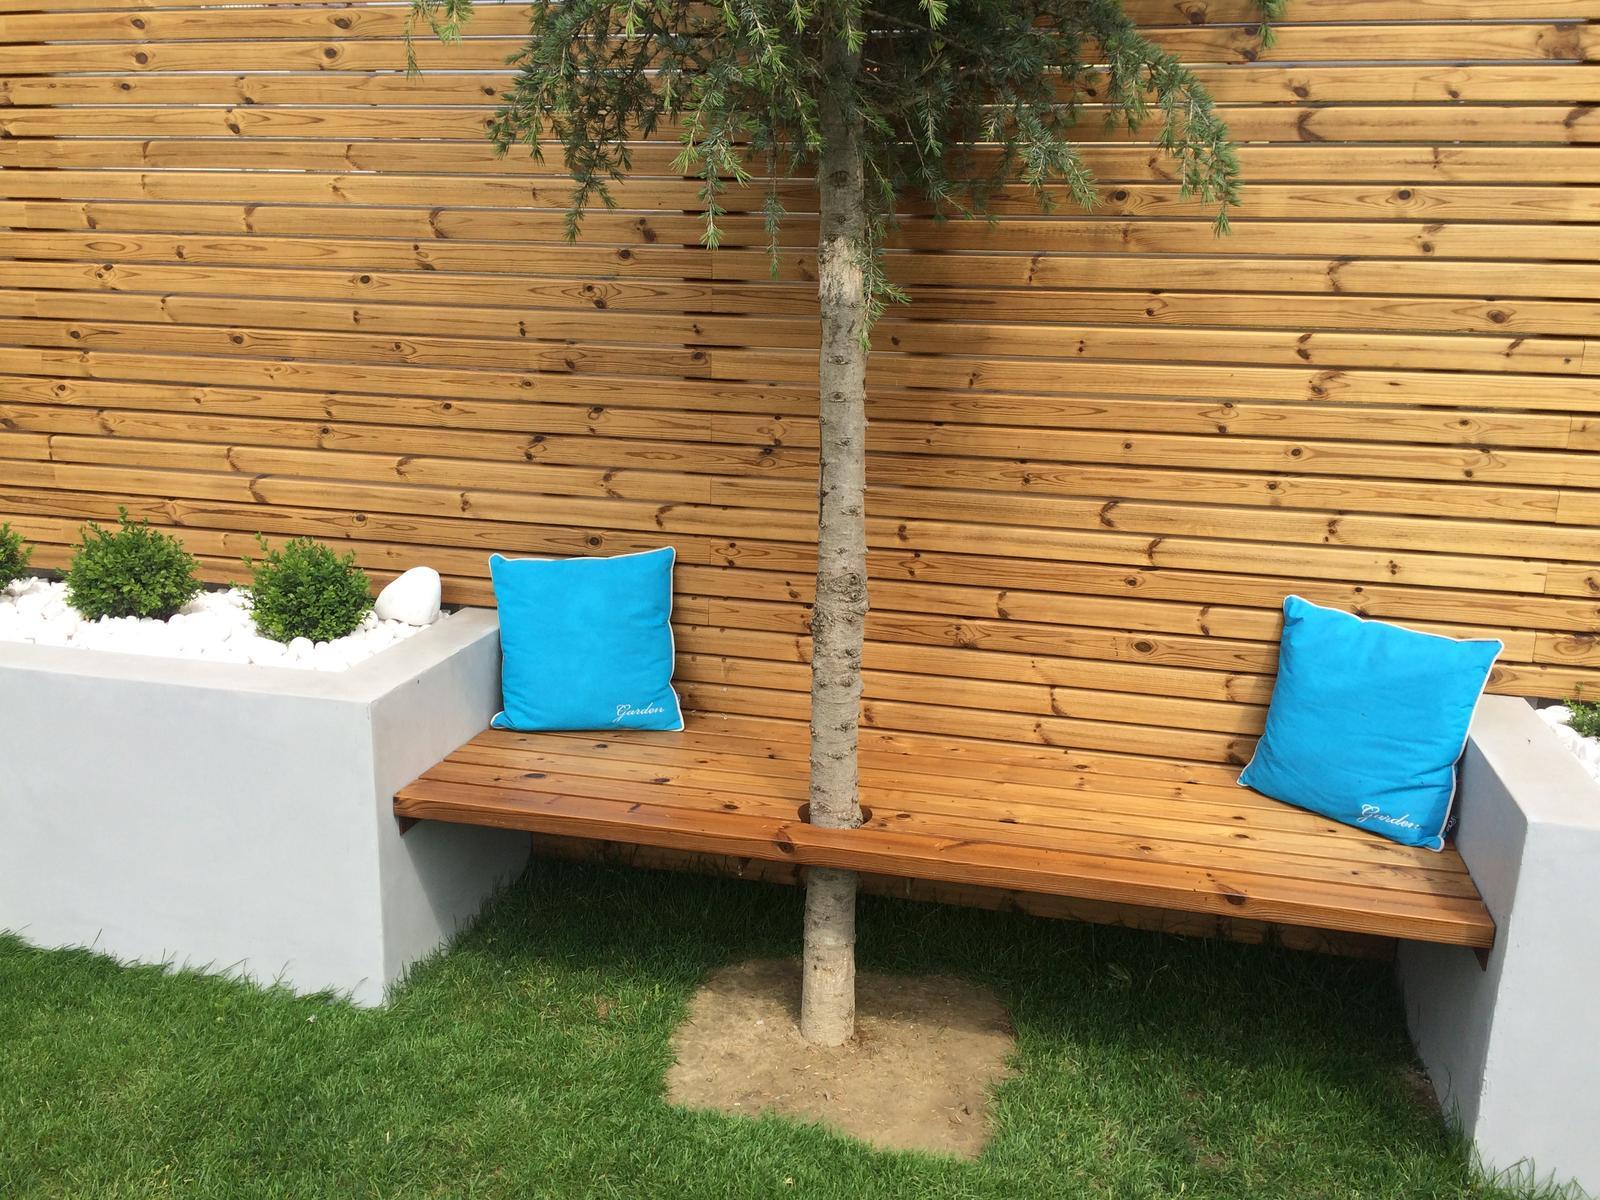 Zahradka - nedokoncena lavica, ale sedi sa na nej super uz teraz